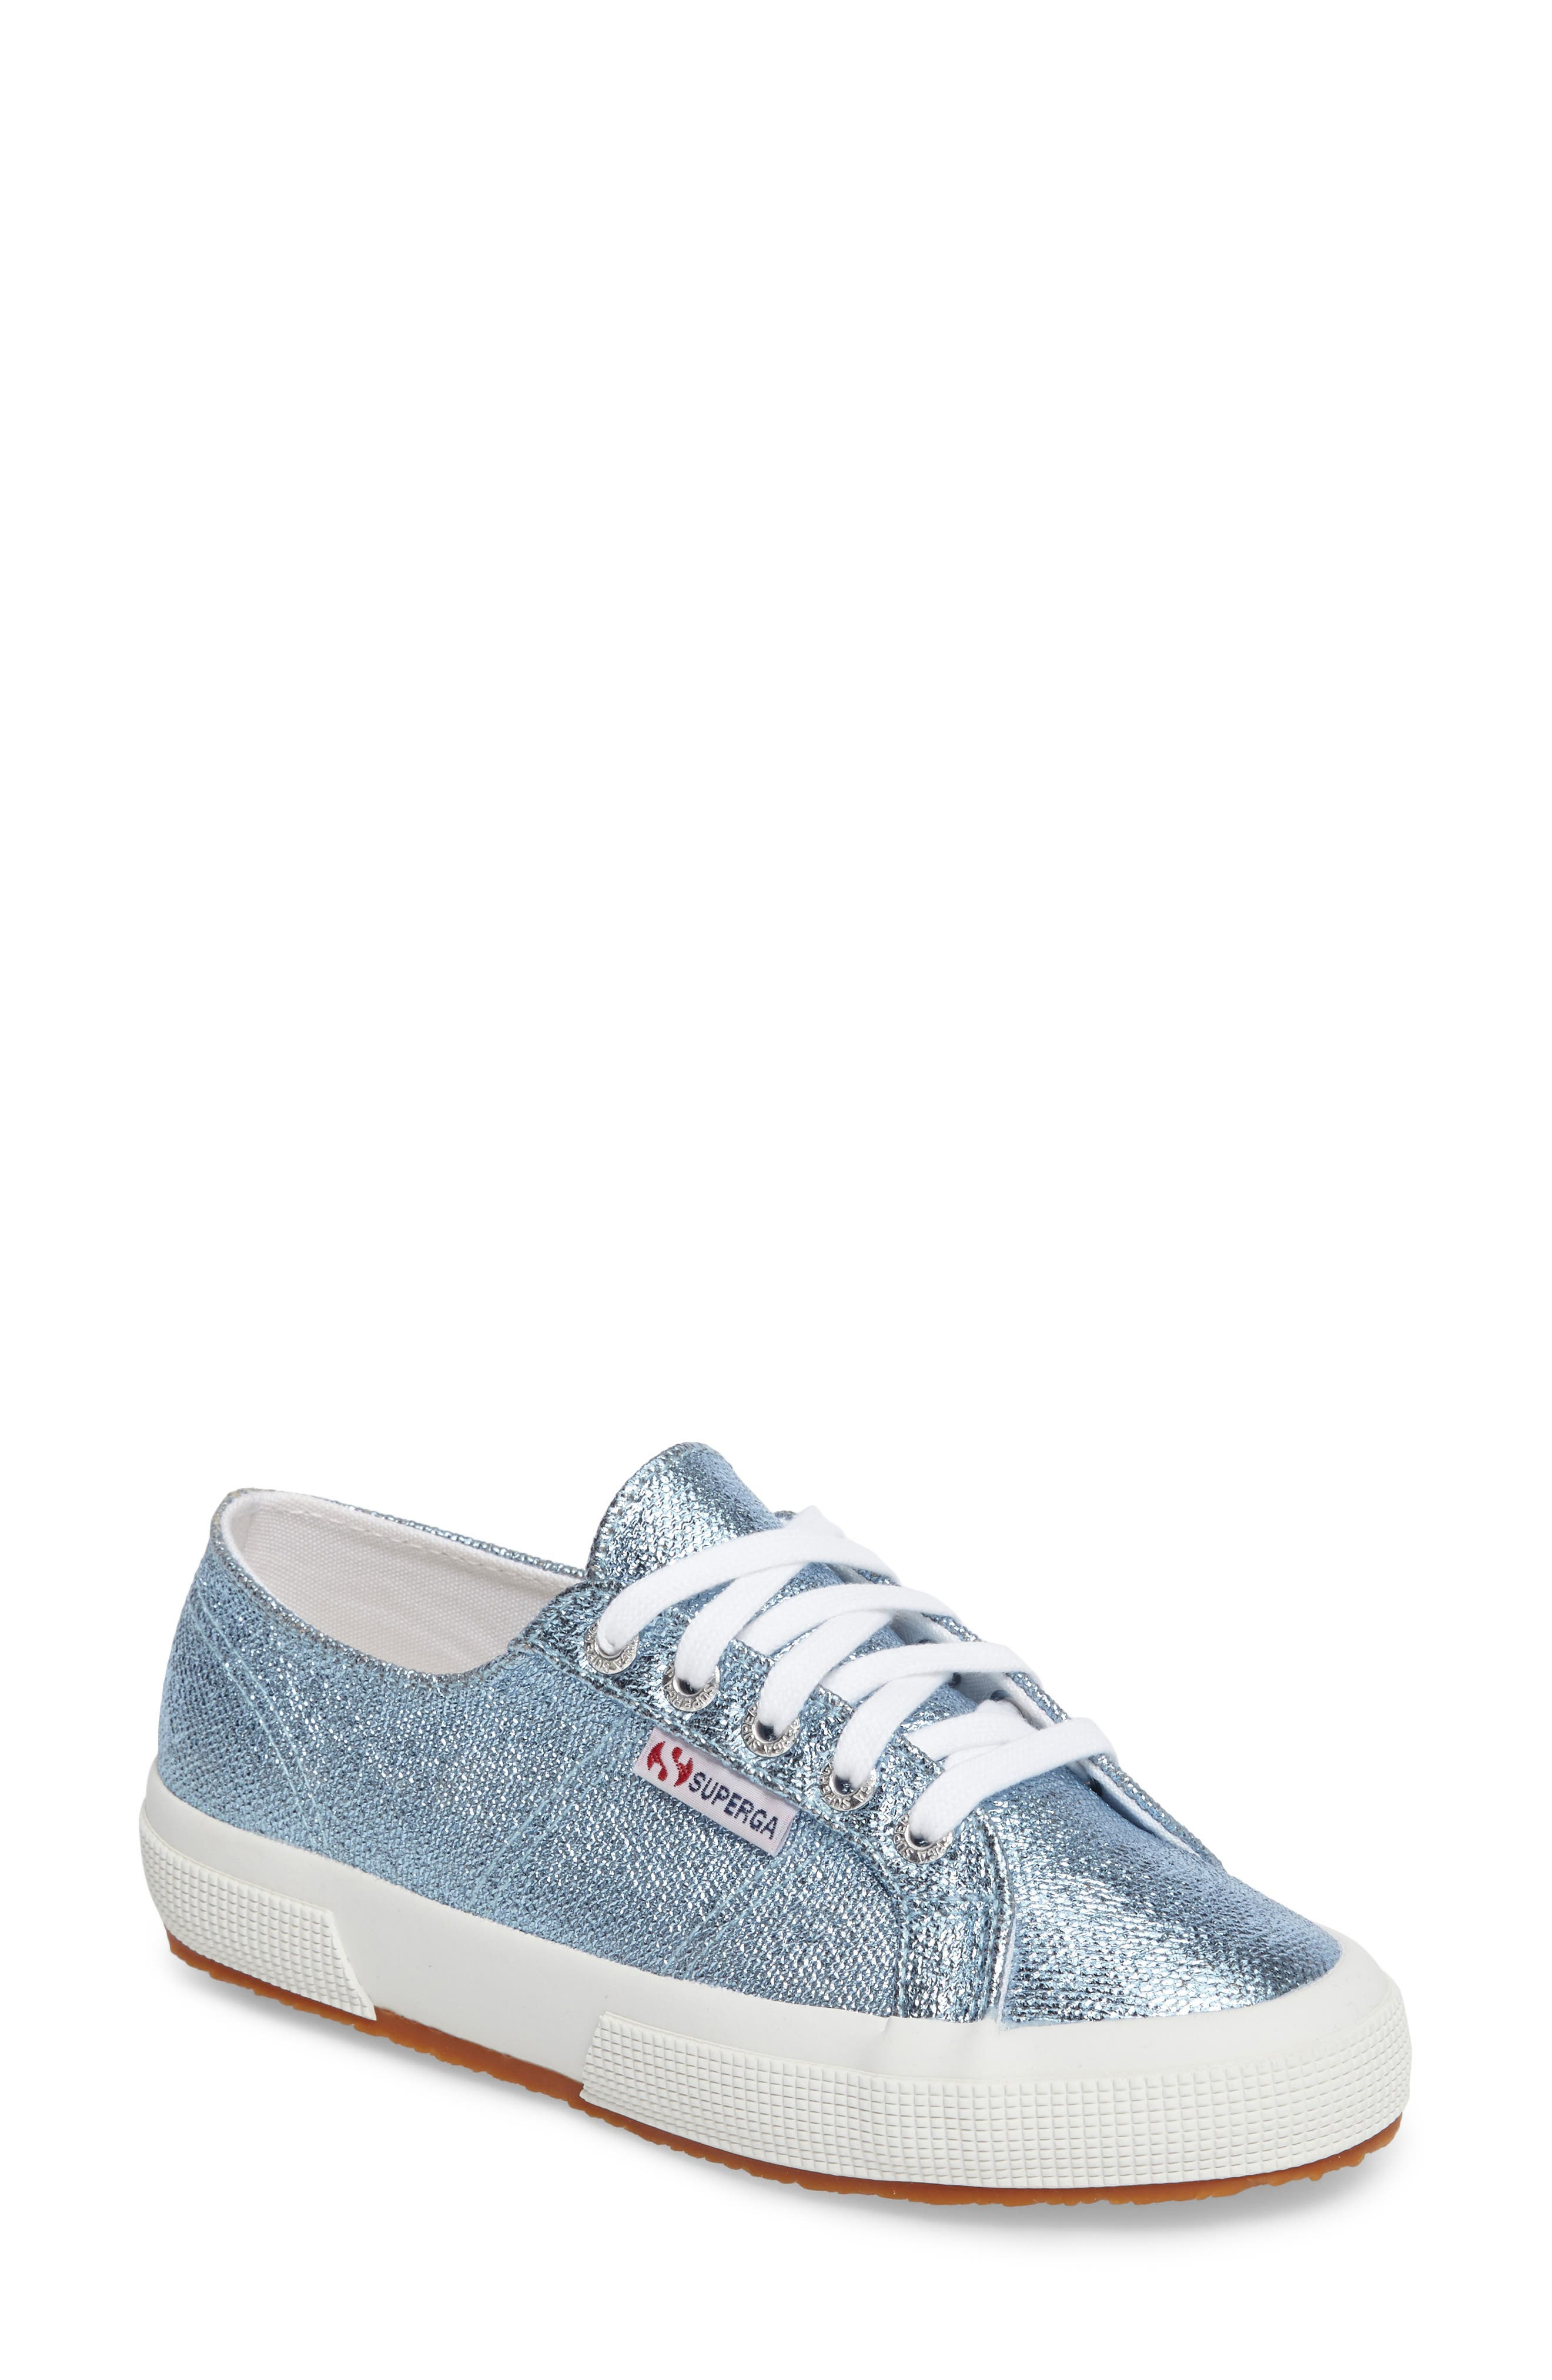 2750 Metallic Sneaker,                             Main thumbnail 1, color,                             Light Blue